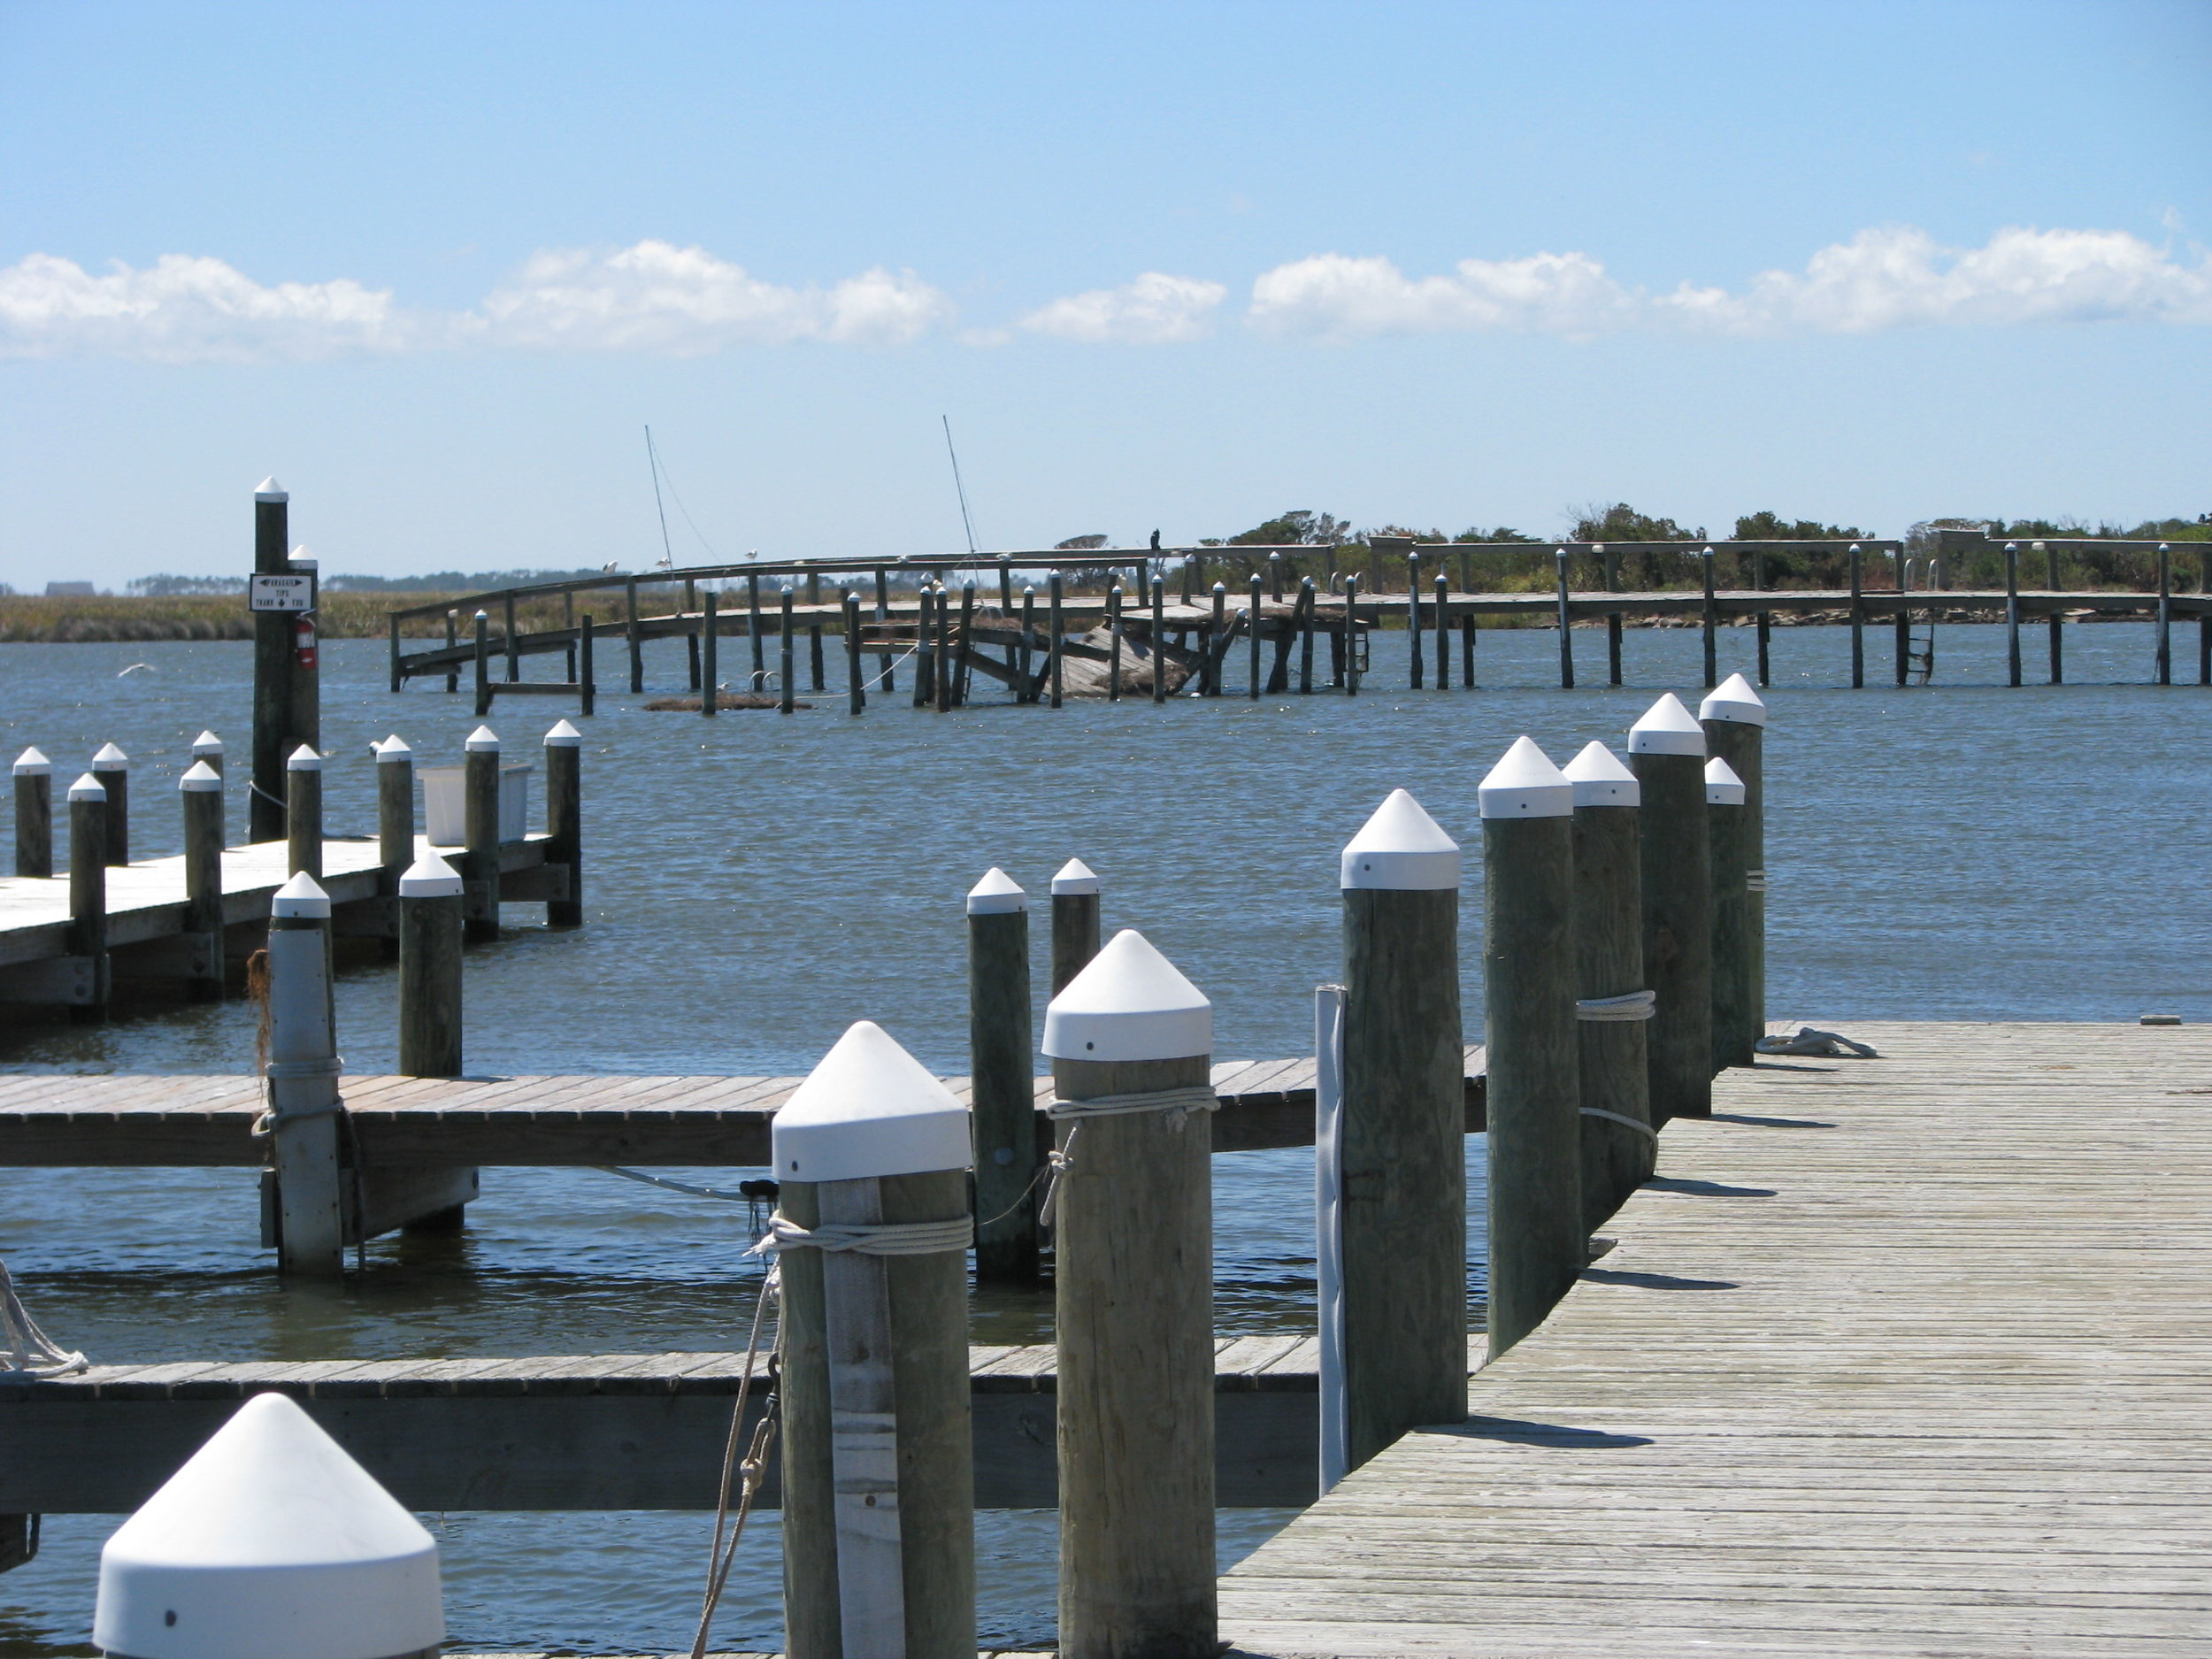 docks-piers-1.jpg